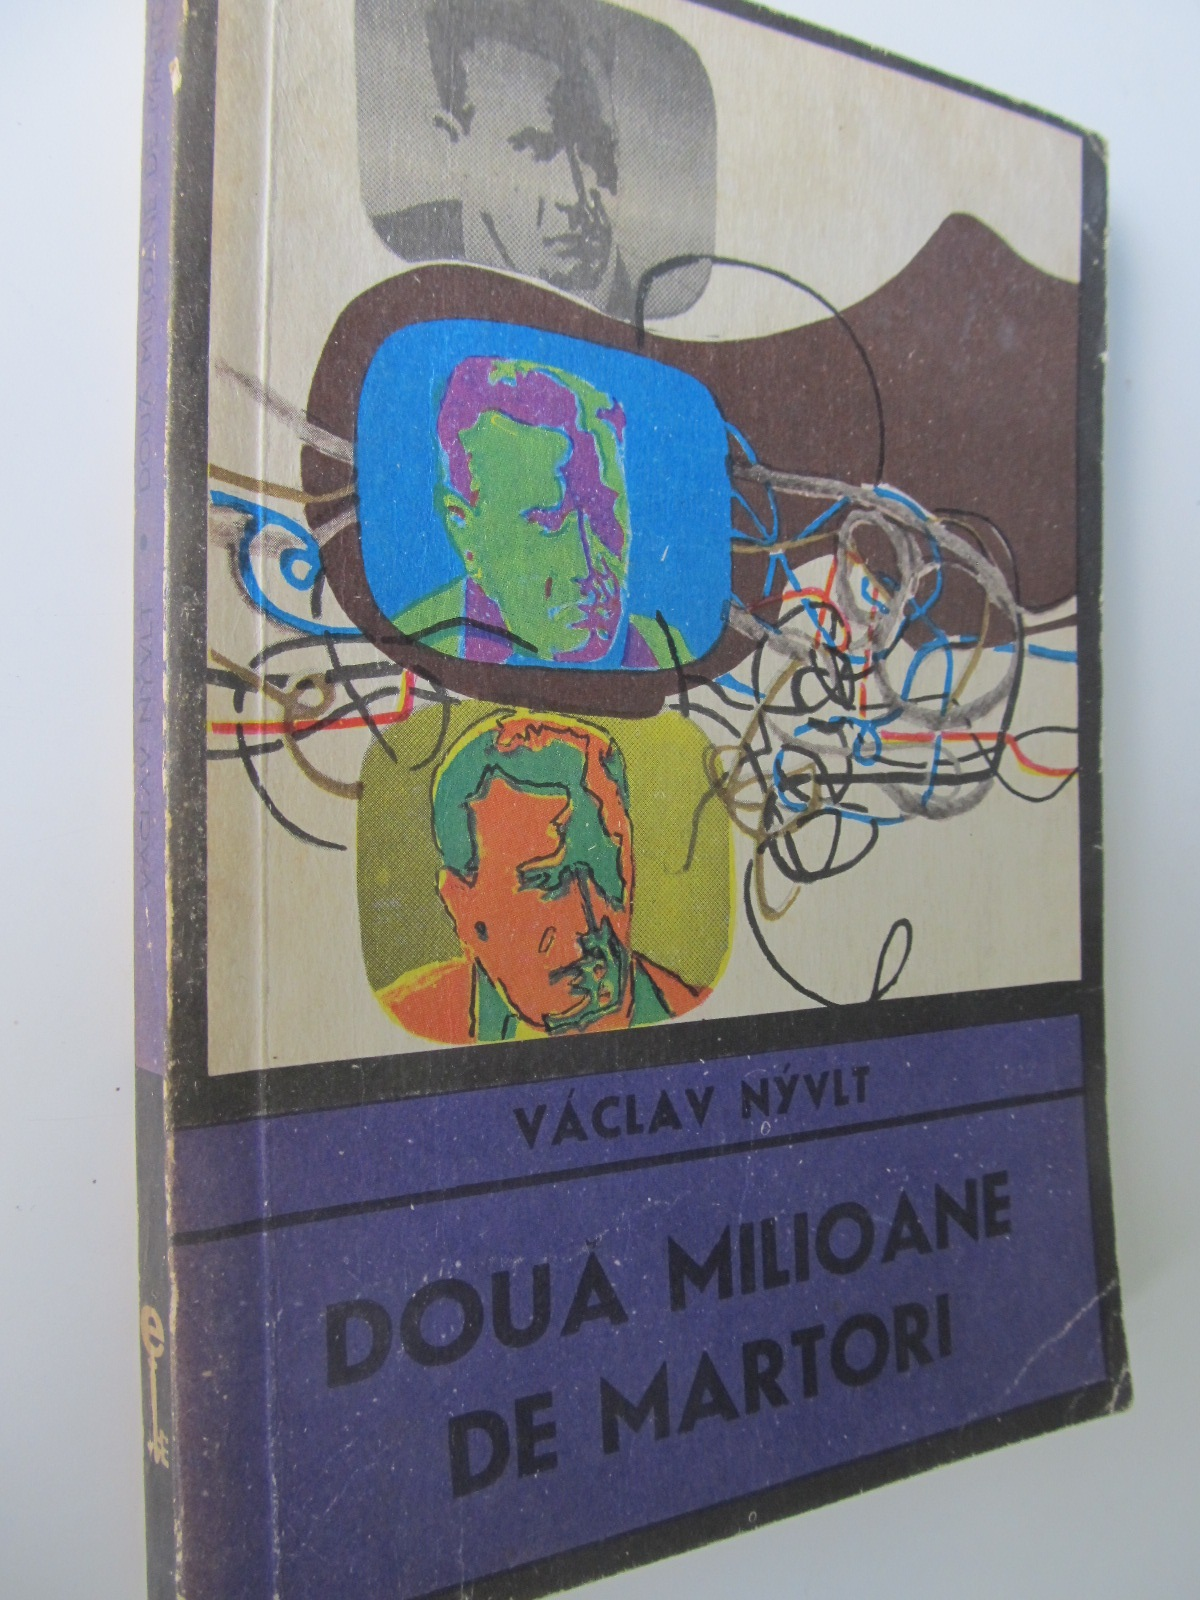 Doua milioane de martori - Vaclav Nyvlt | Detalii carte